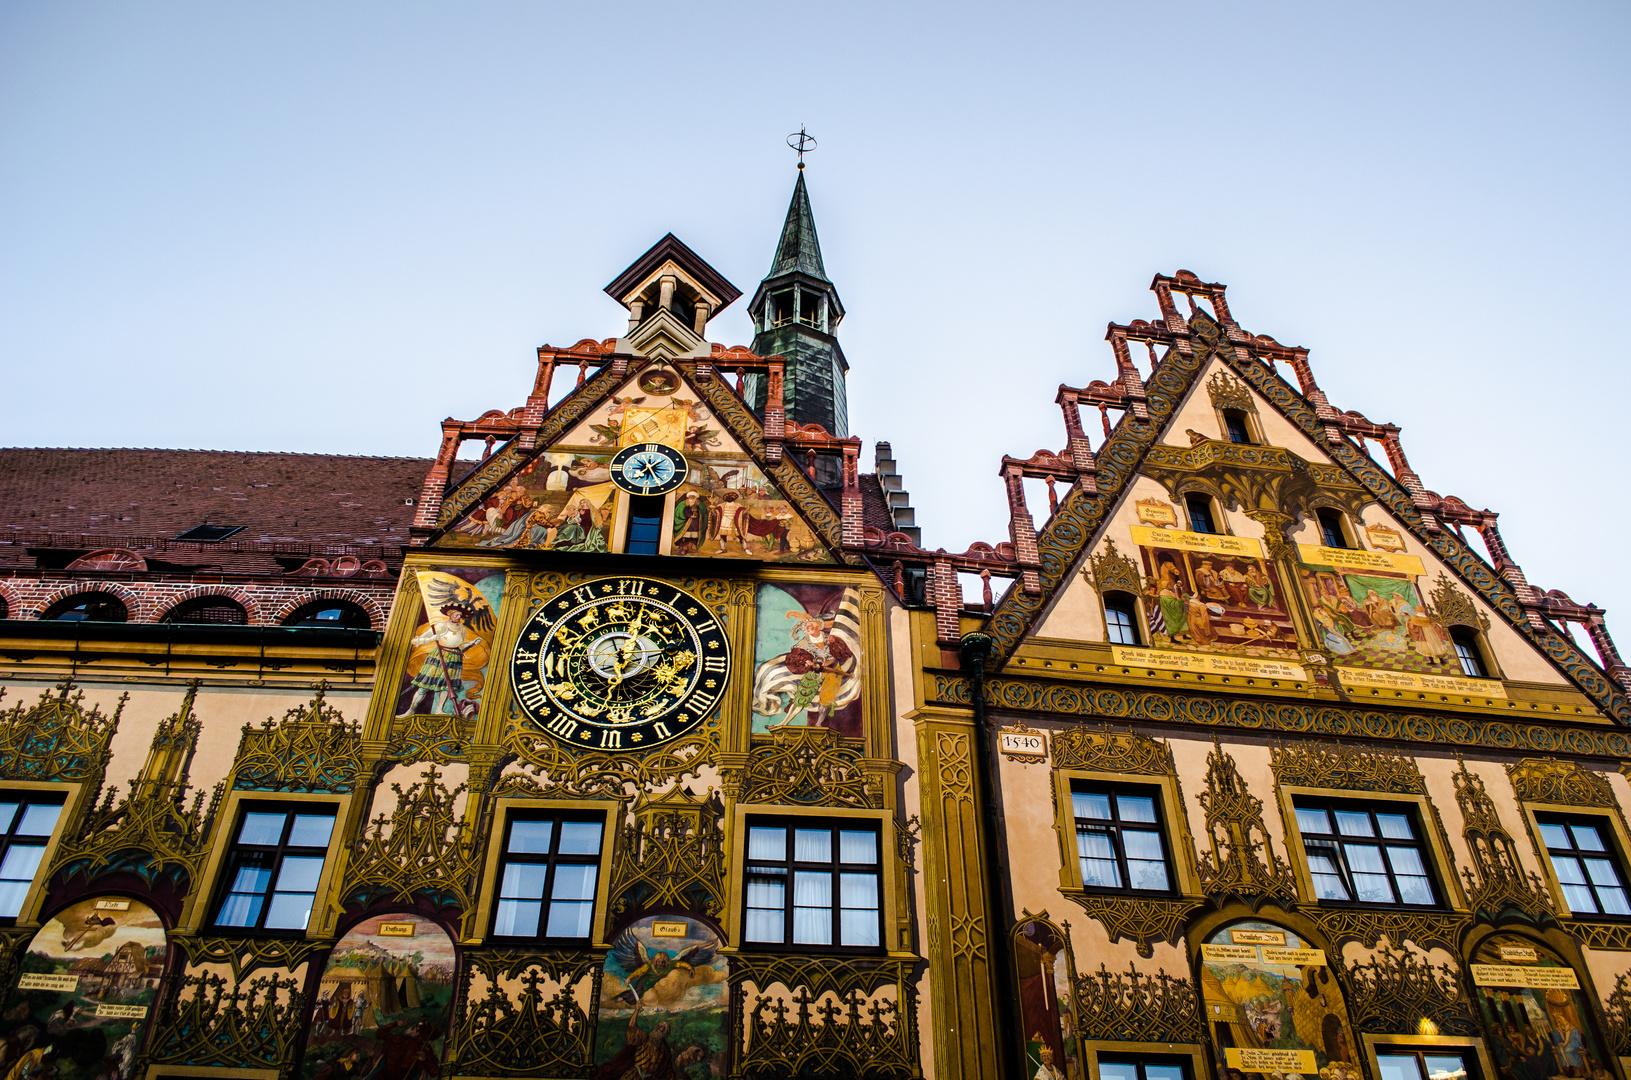 Ulmer Rathaus